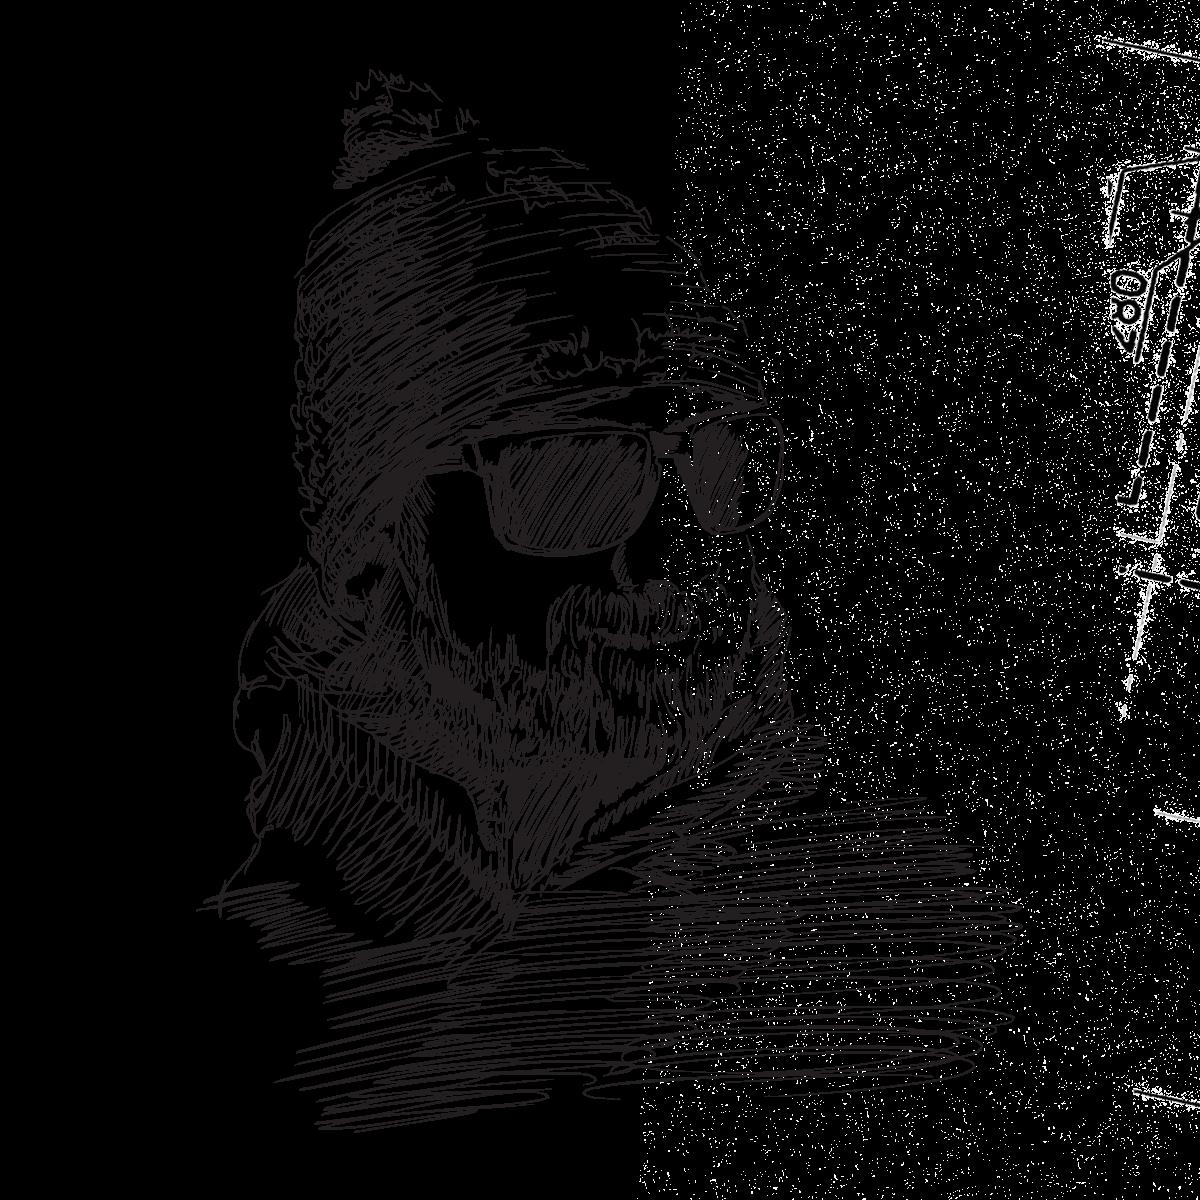 https://www.satinagarden.ro/wp-content/uploads/2017/05/minimalist-image-team-member-02-large.png